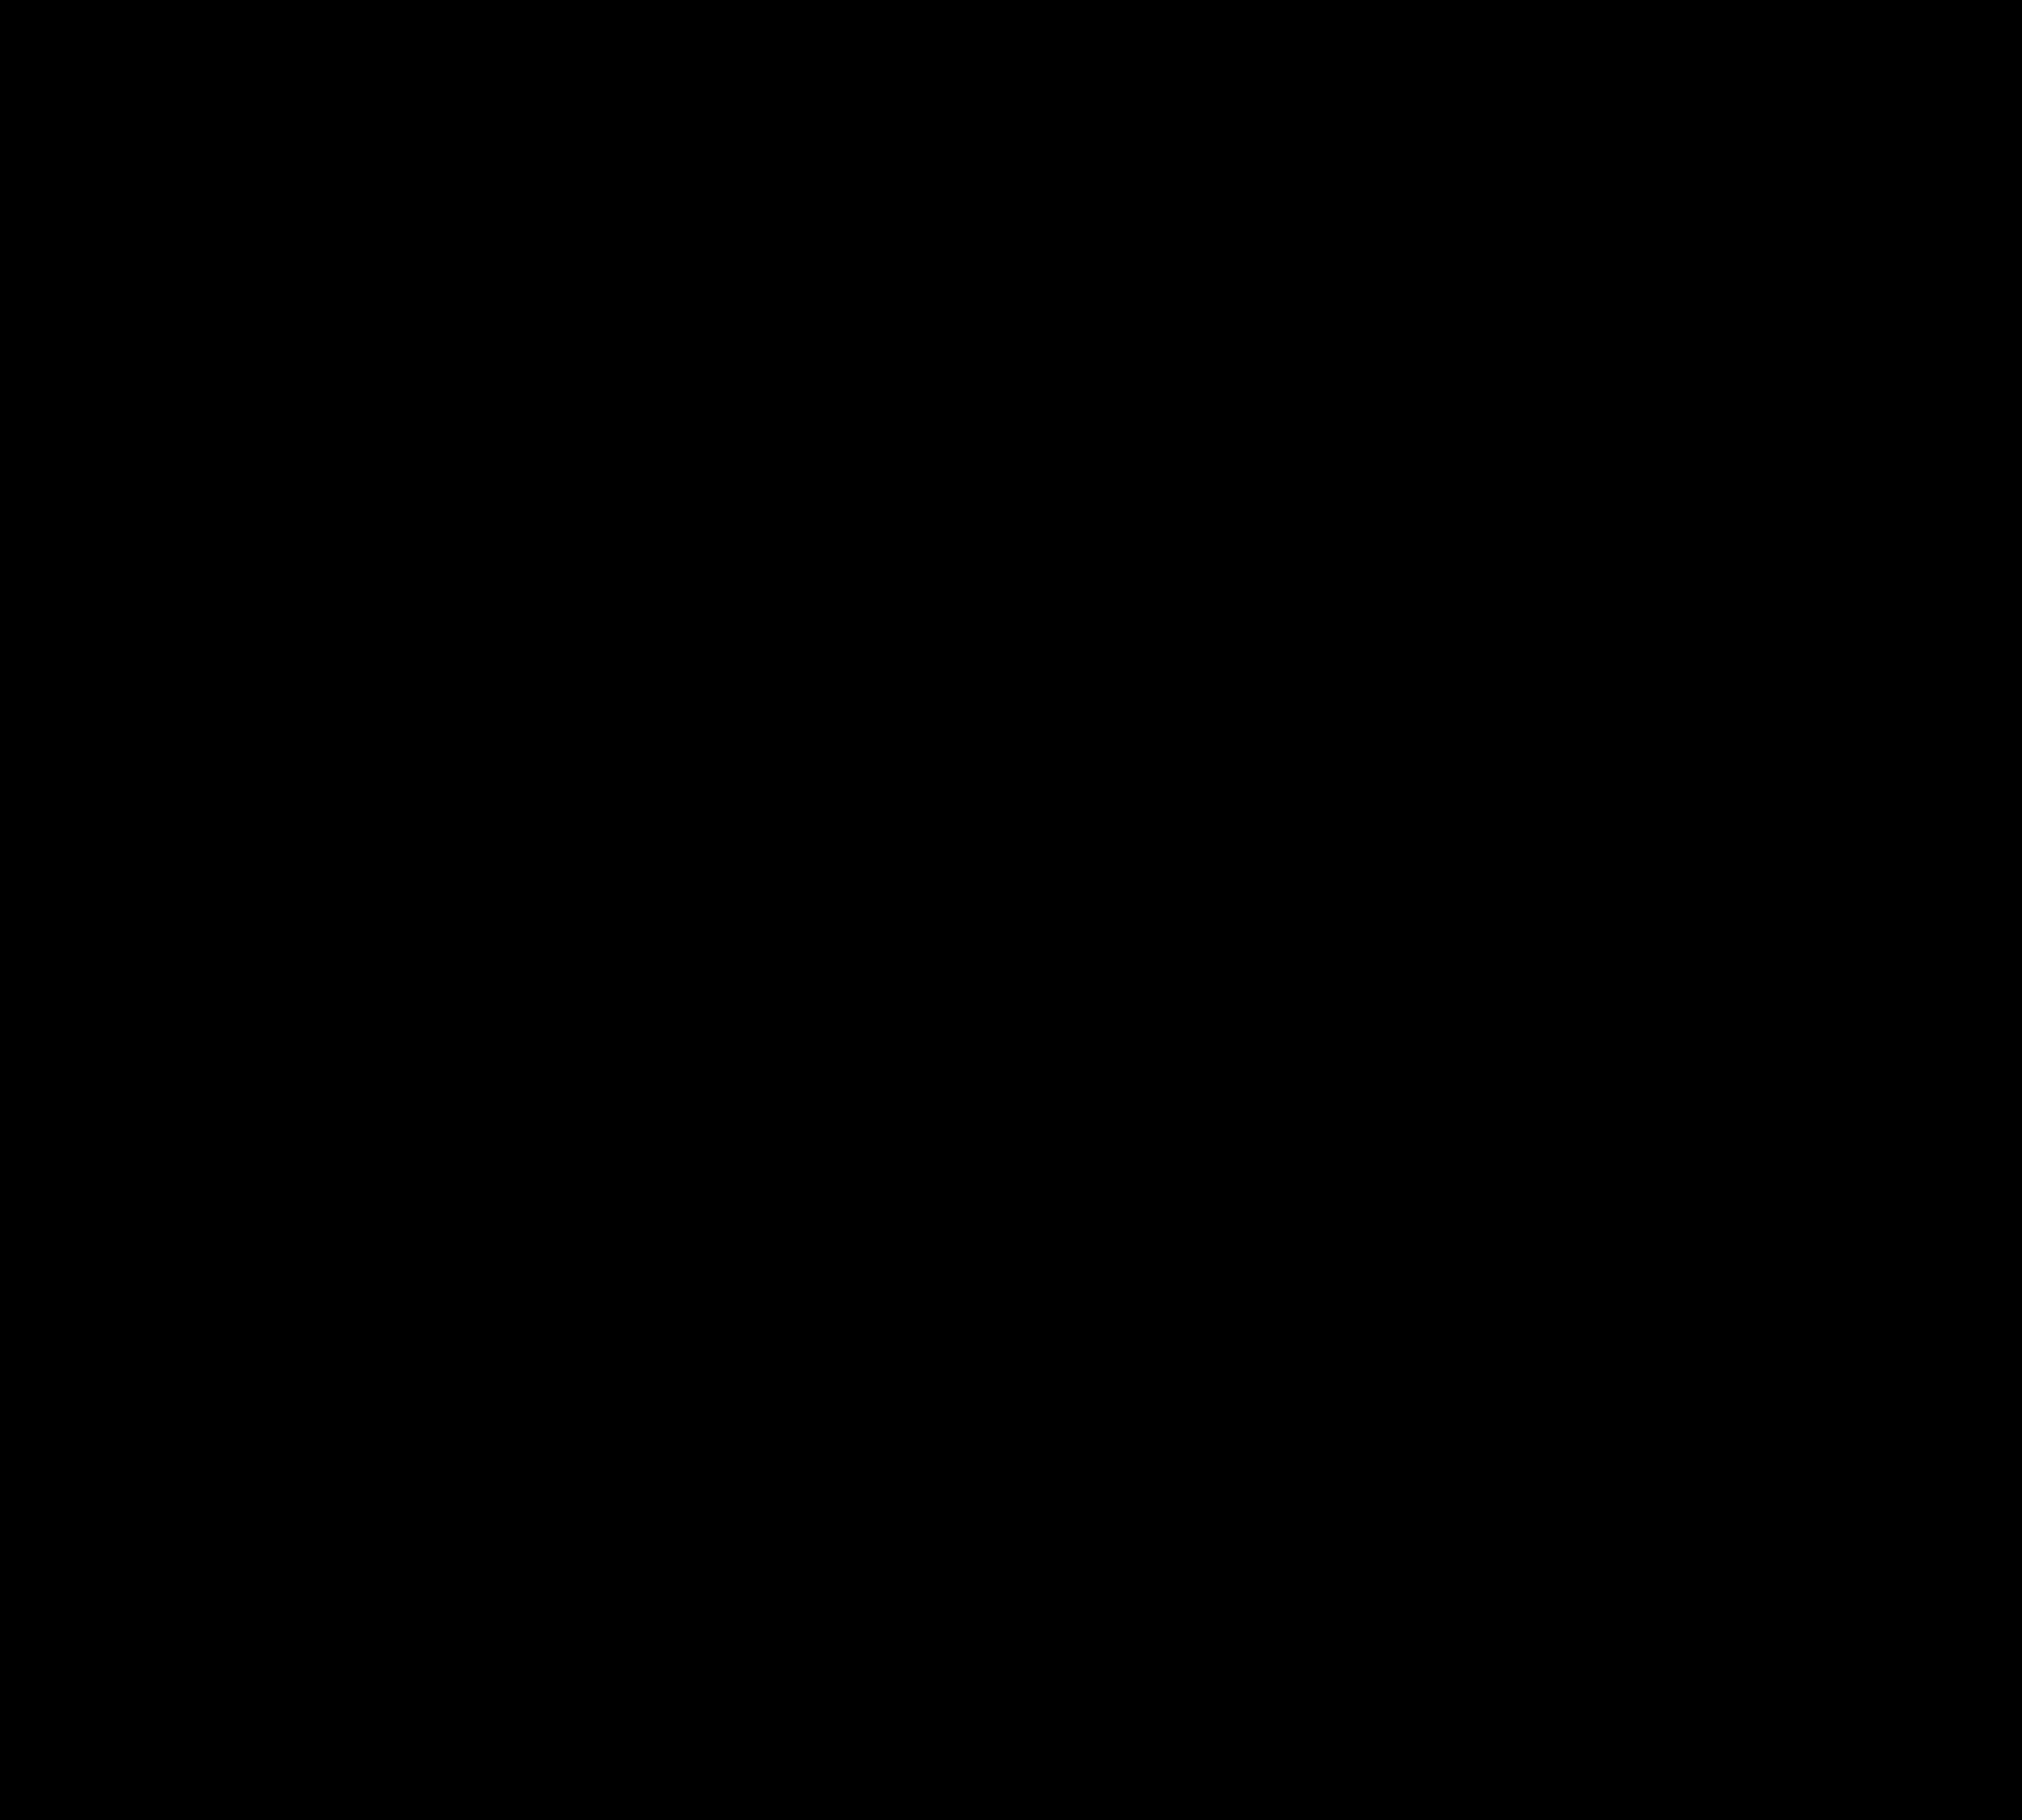 WC_logo_black-02.png